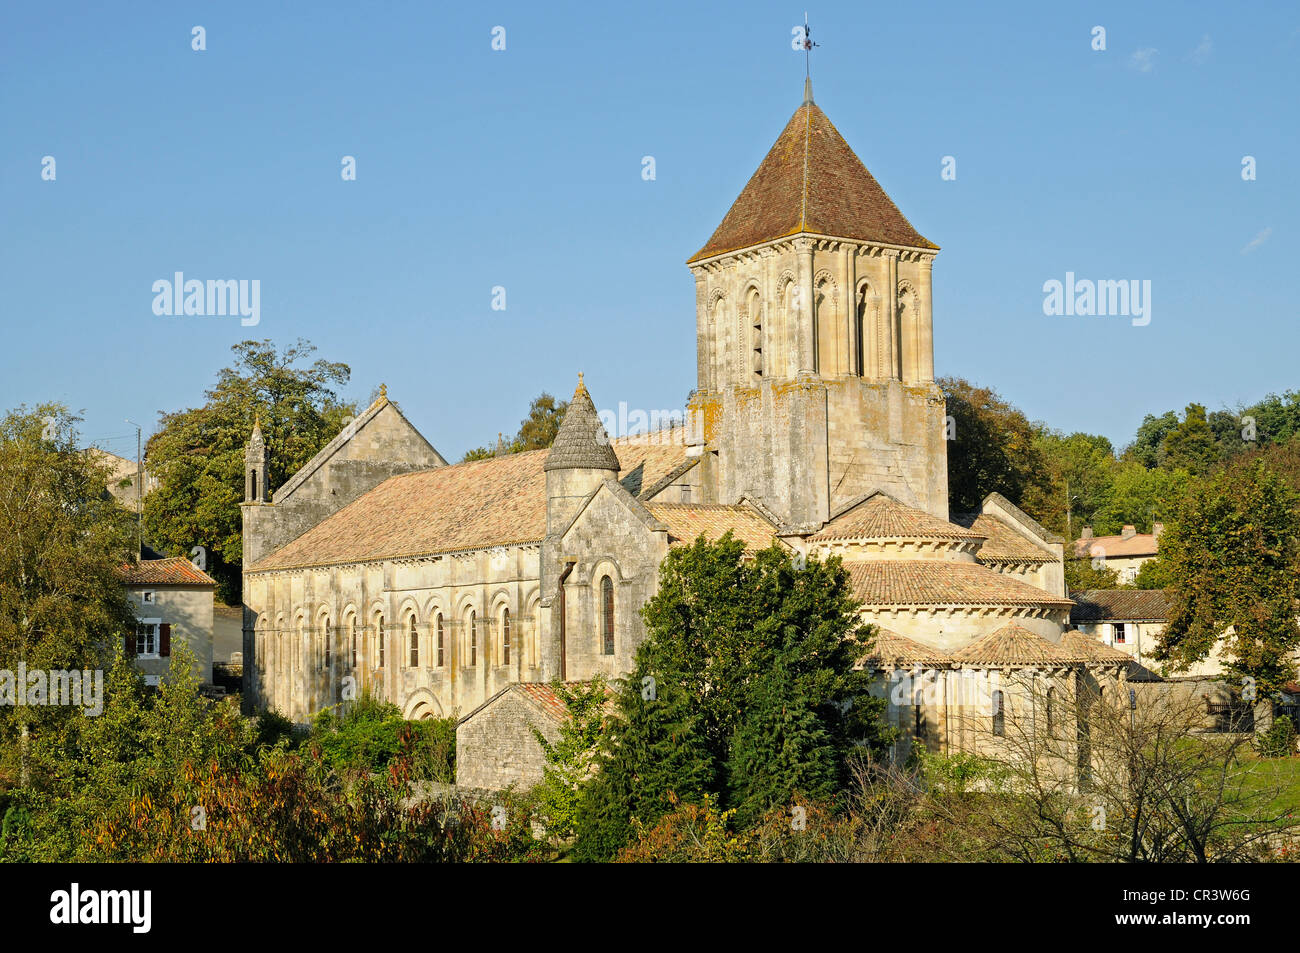 Eglise Saint Hilaire church, French Way, Way of St James, Melle, Poitiers, Department of Deux-Sevres, Poitou-Charentes, - Stock Image